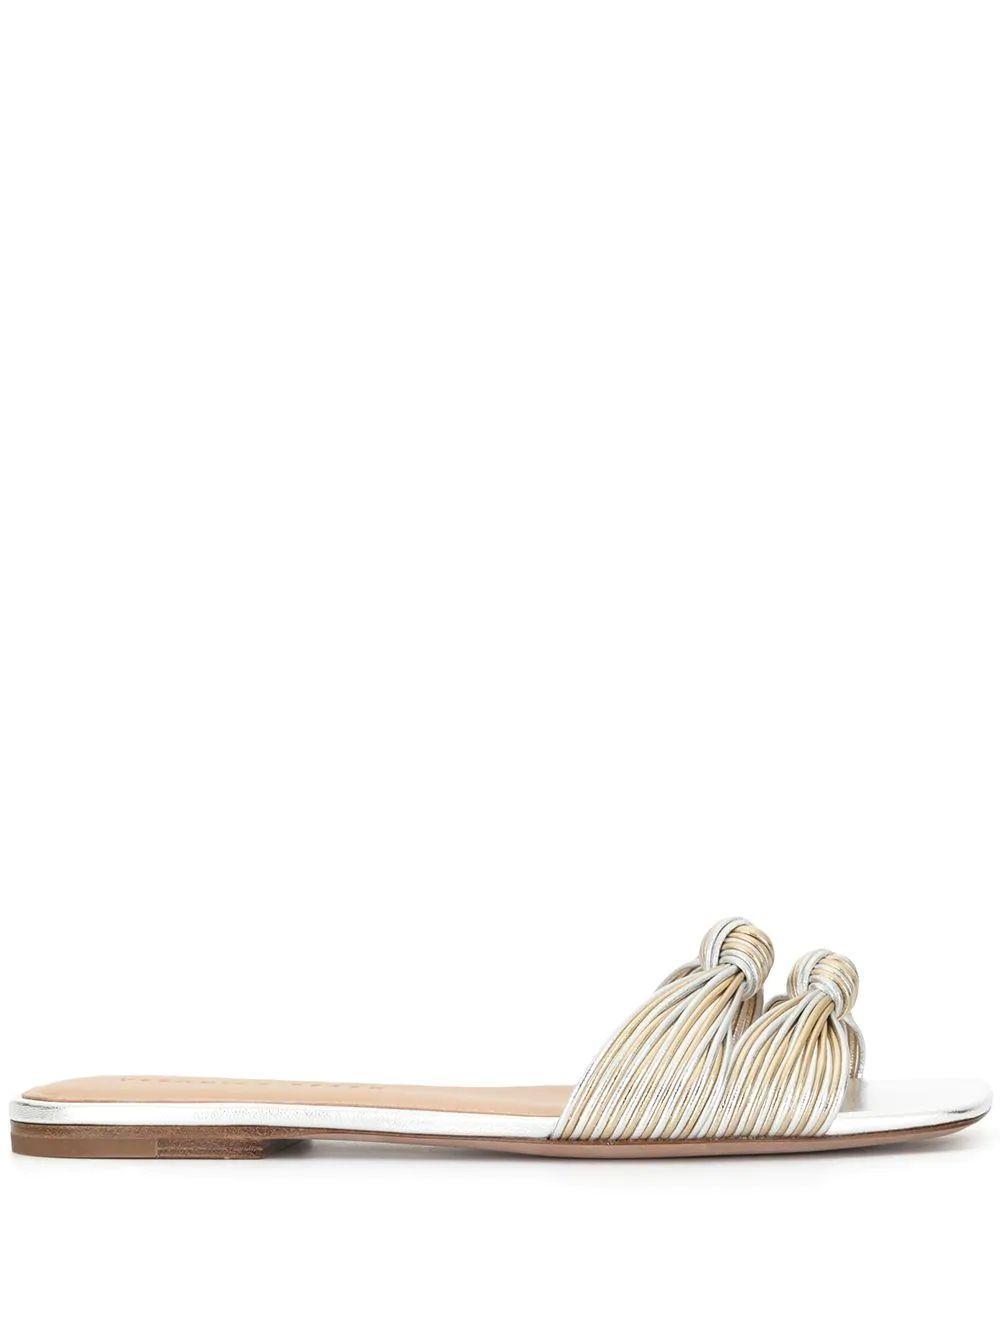 Gemma Knot Slide Sandal Item # GEMMA-S20